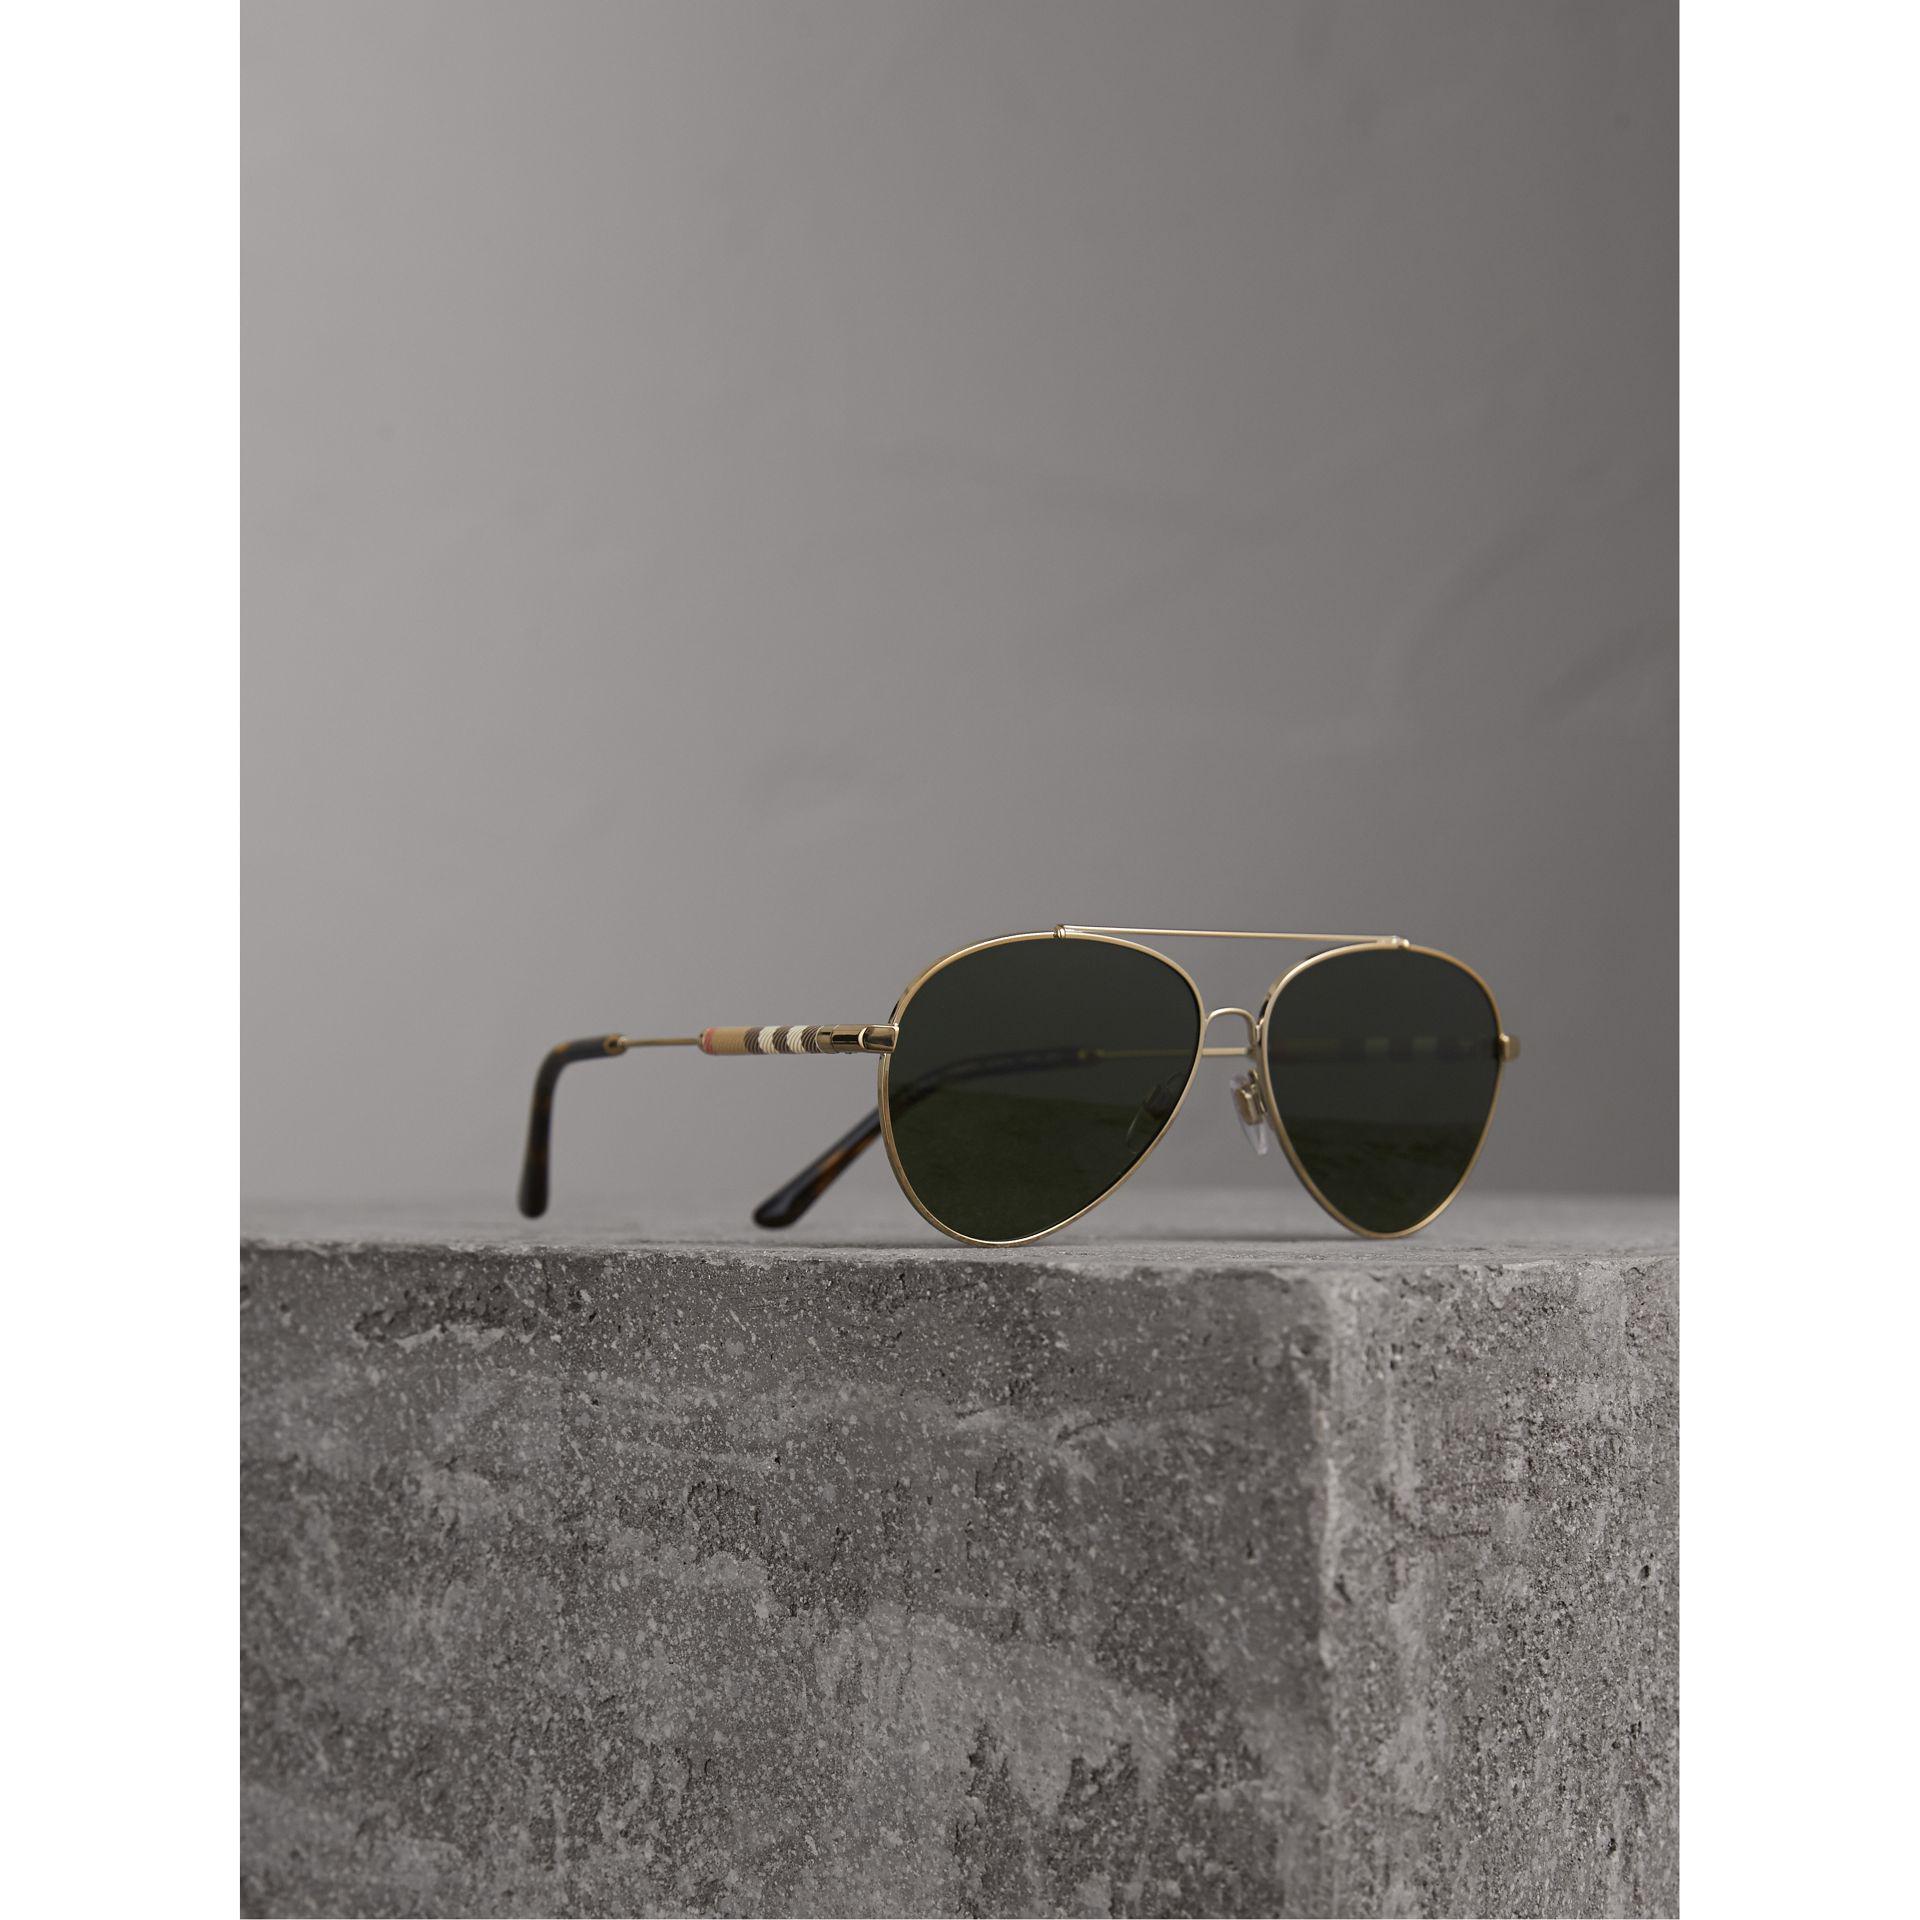 0915b6c8051 Lyst - Burberry Check Detail Pilot Sunglasses